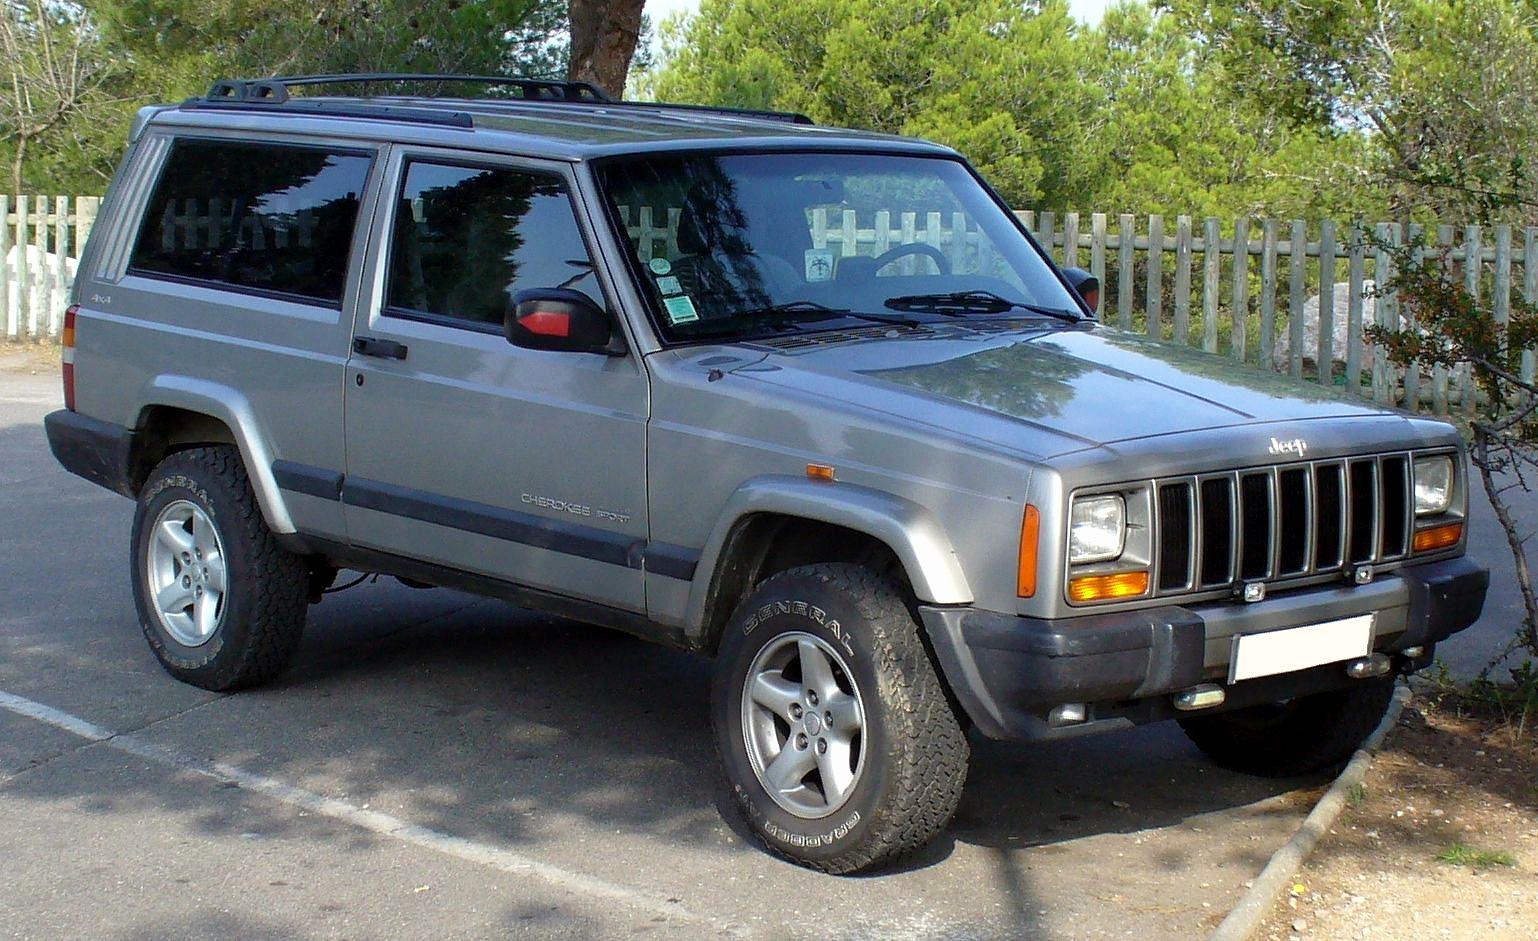 file:jeep cherokee sport 4x4 - wikimedia commons